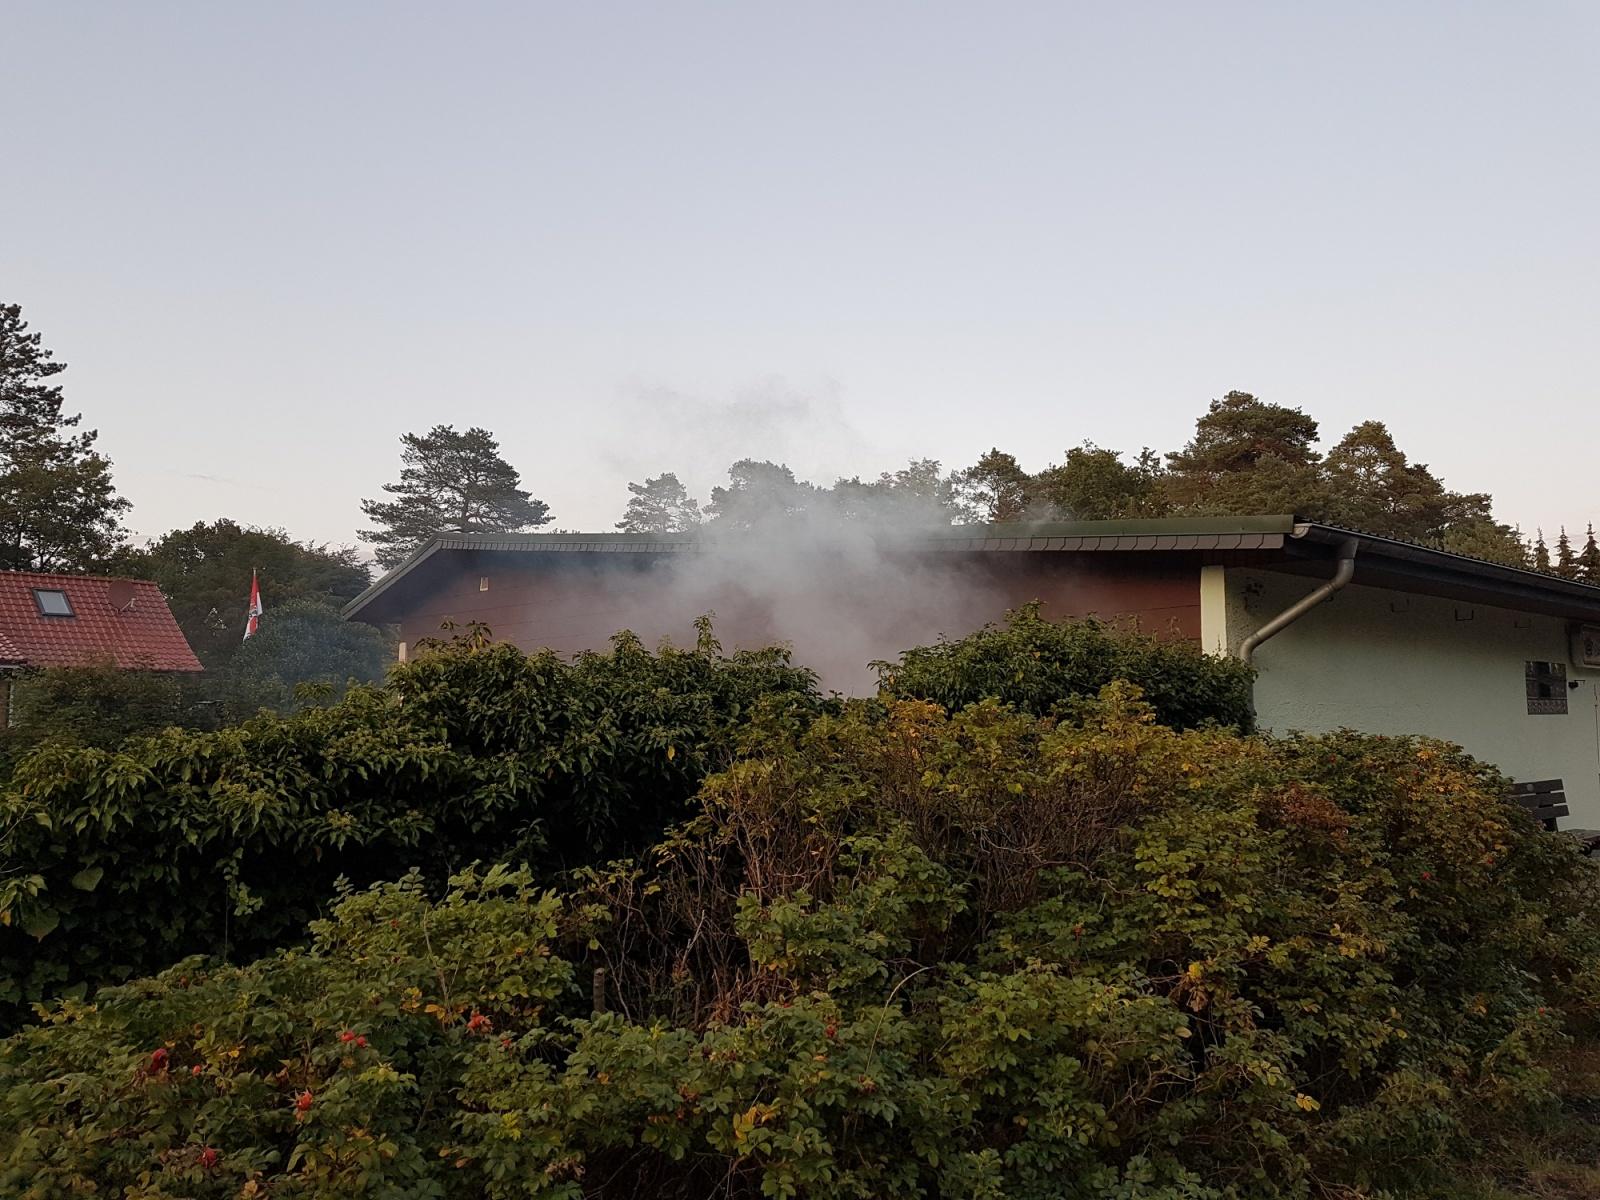 19-09-10-Übung-Schützenhaus-1